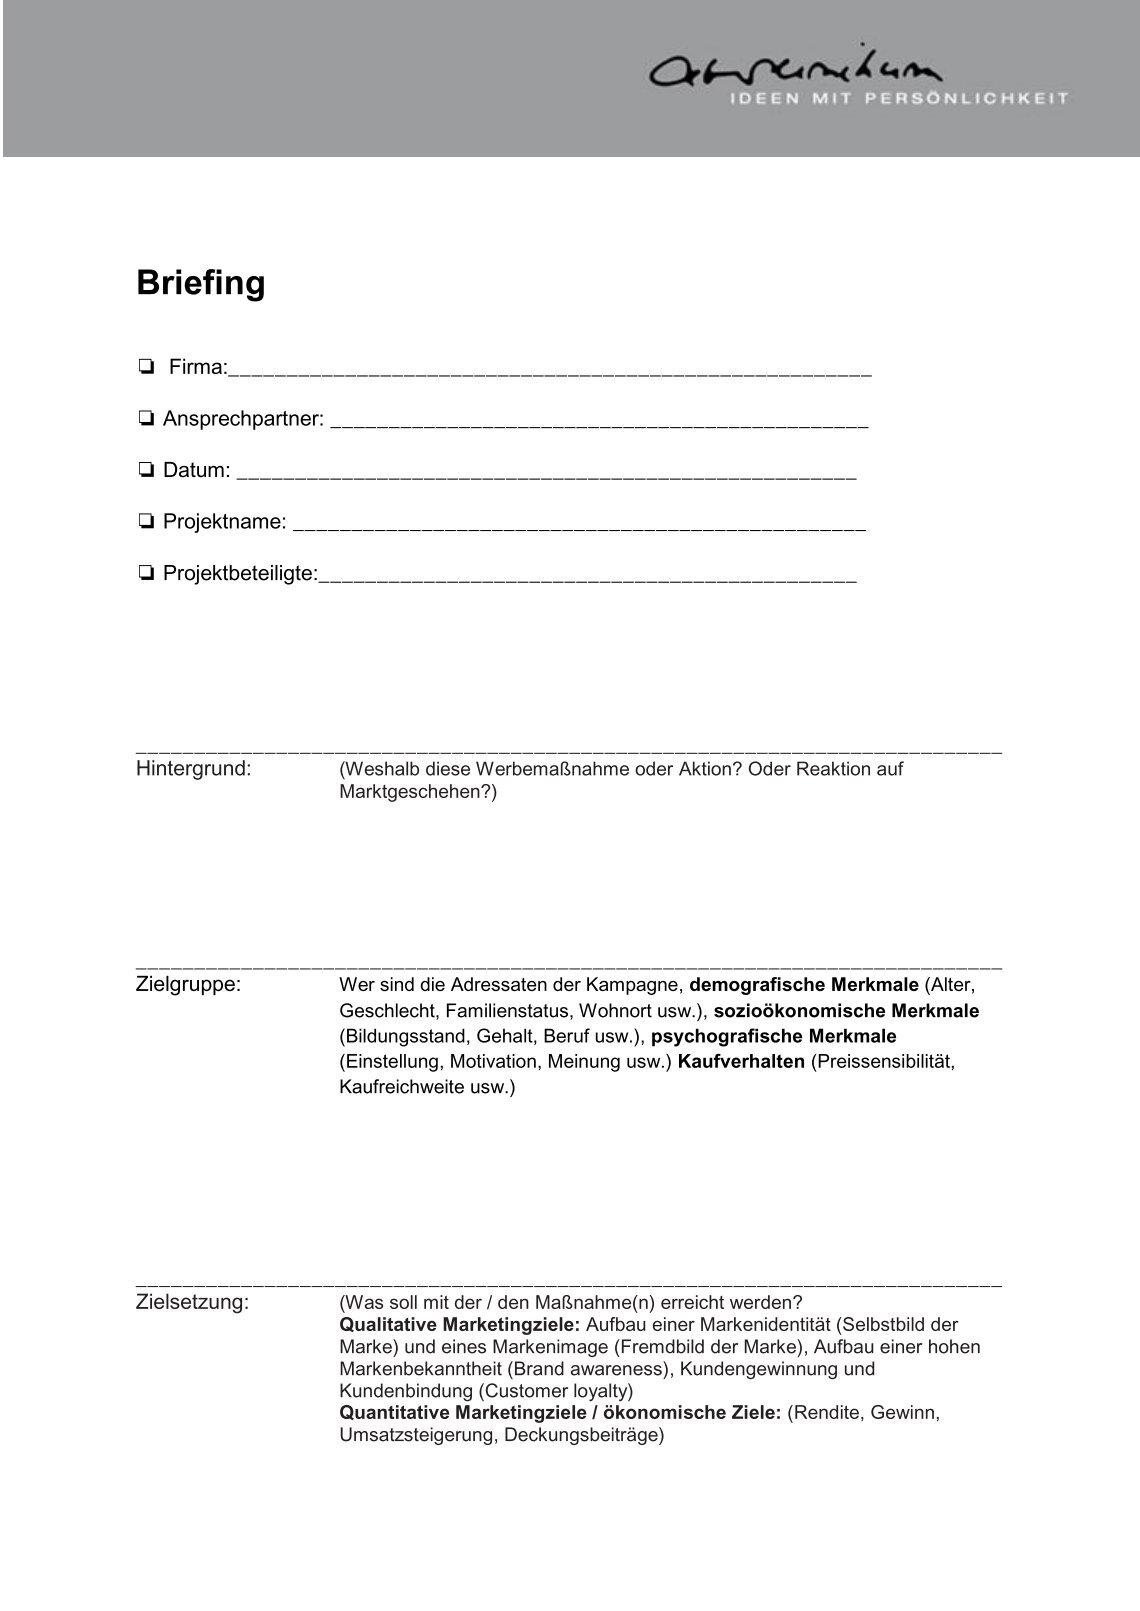 Großzügig Musterwiederaufnahmeformat Wortdokument Galerie - Entry ...